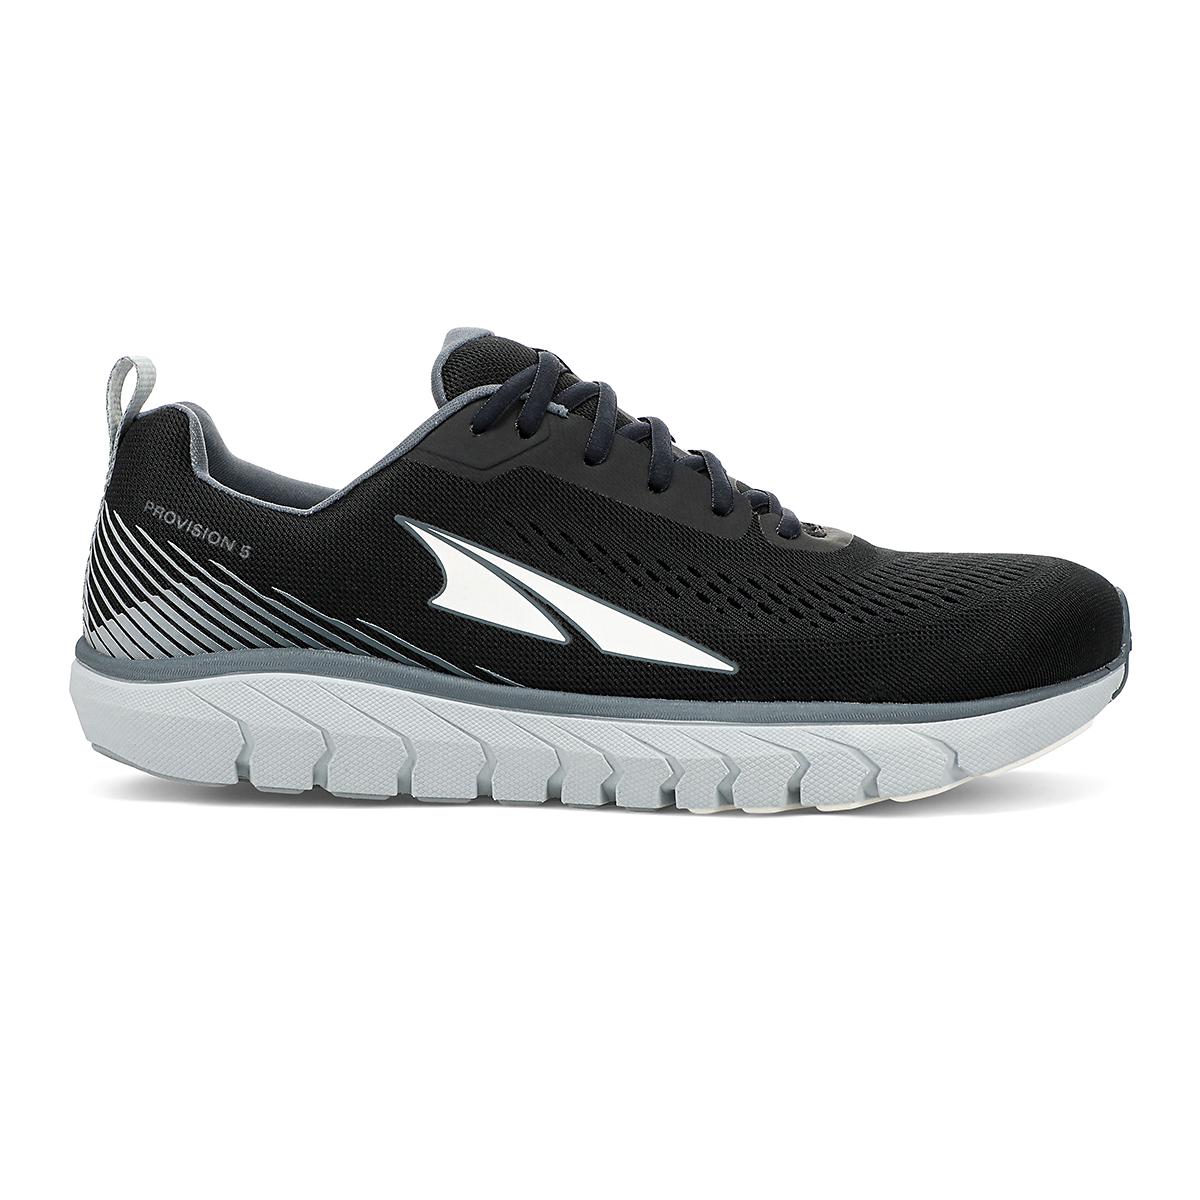 Men's Altra Provision 5 Running Shoe - Color: Black/Gray - Size: 8 - Width: Regular, Black/Gray, large, image 1